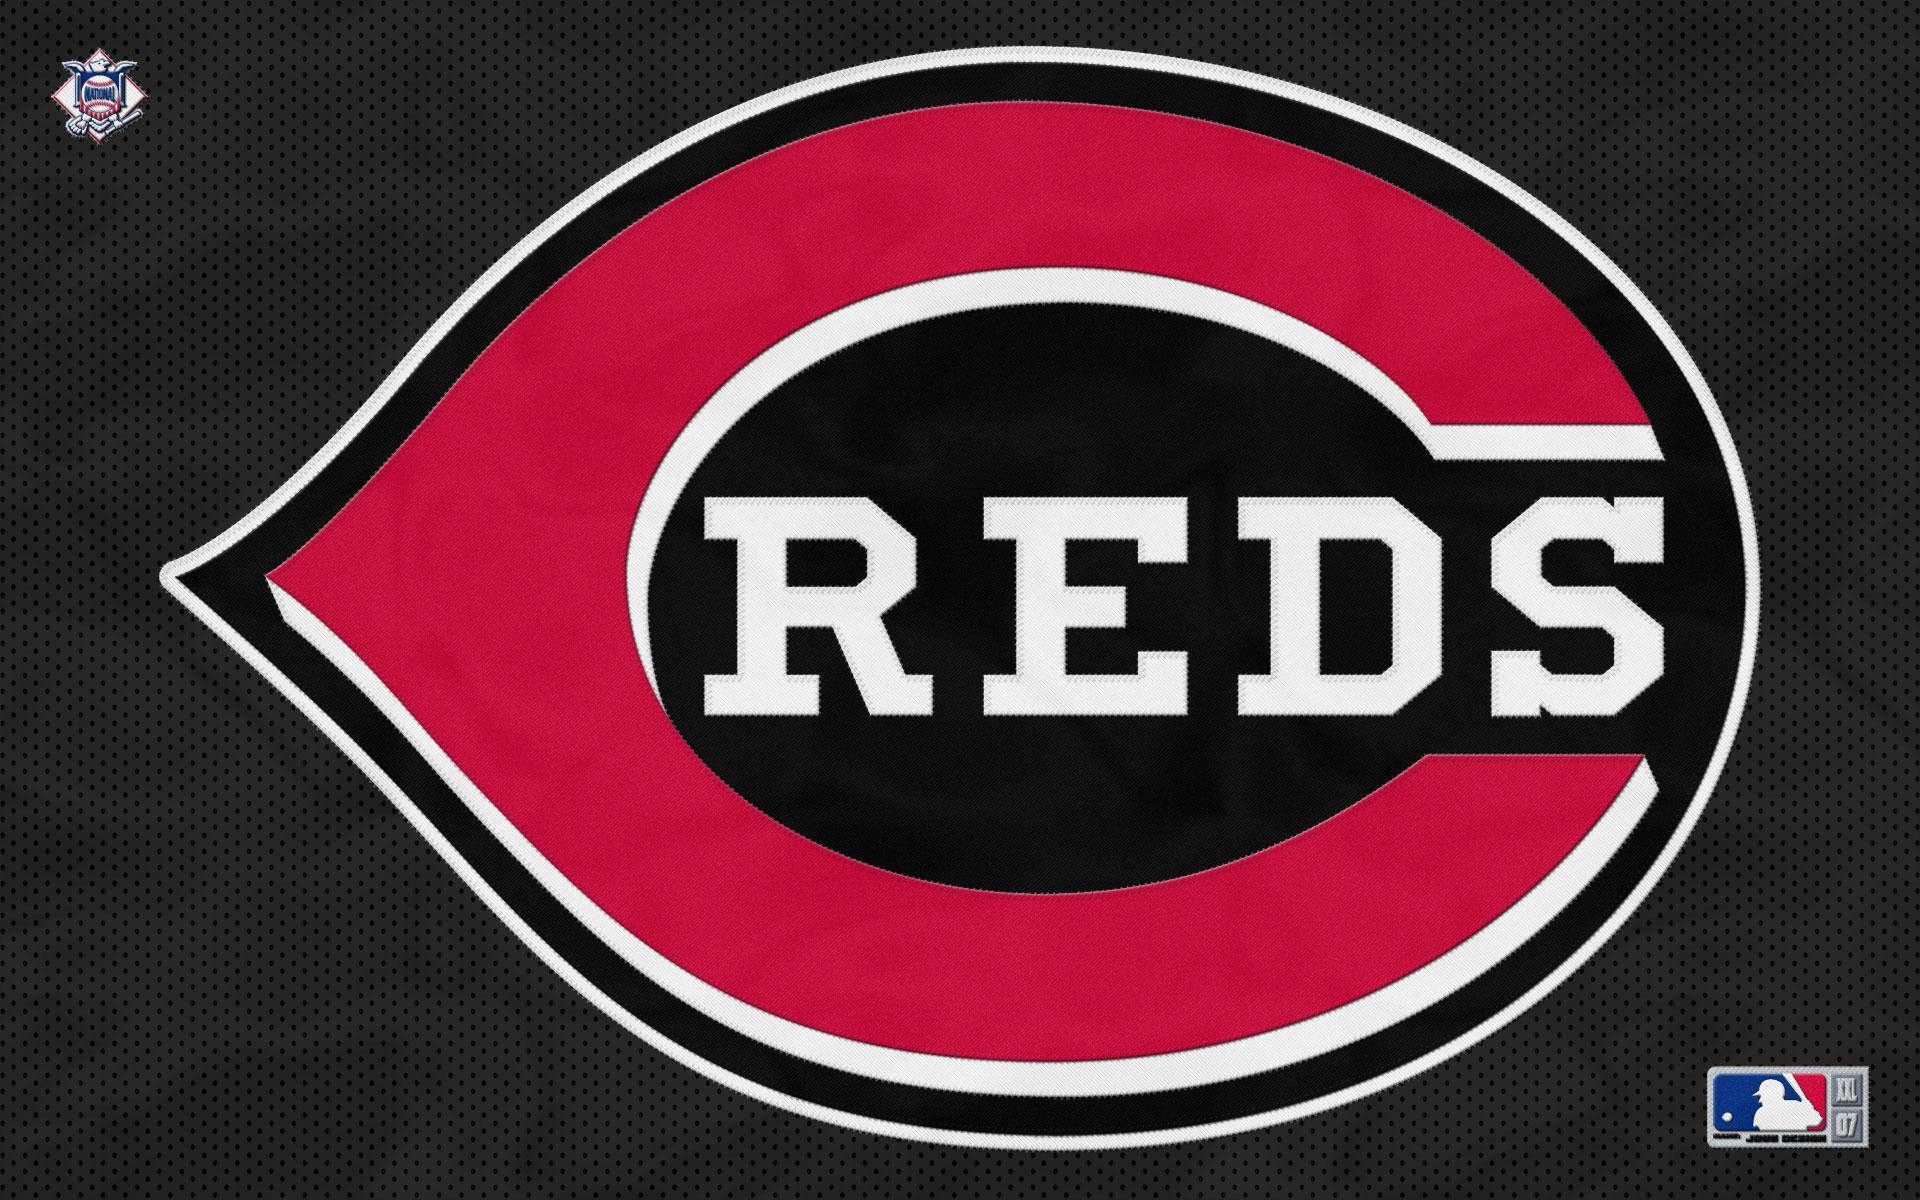 MLB Cincinnati Reds Logo Black Black Background 1920x1200 WIDE MLB 1920x1200